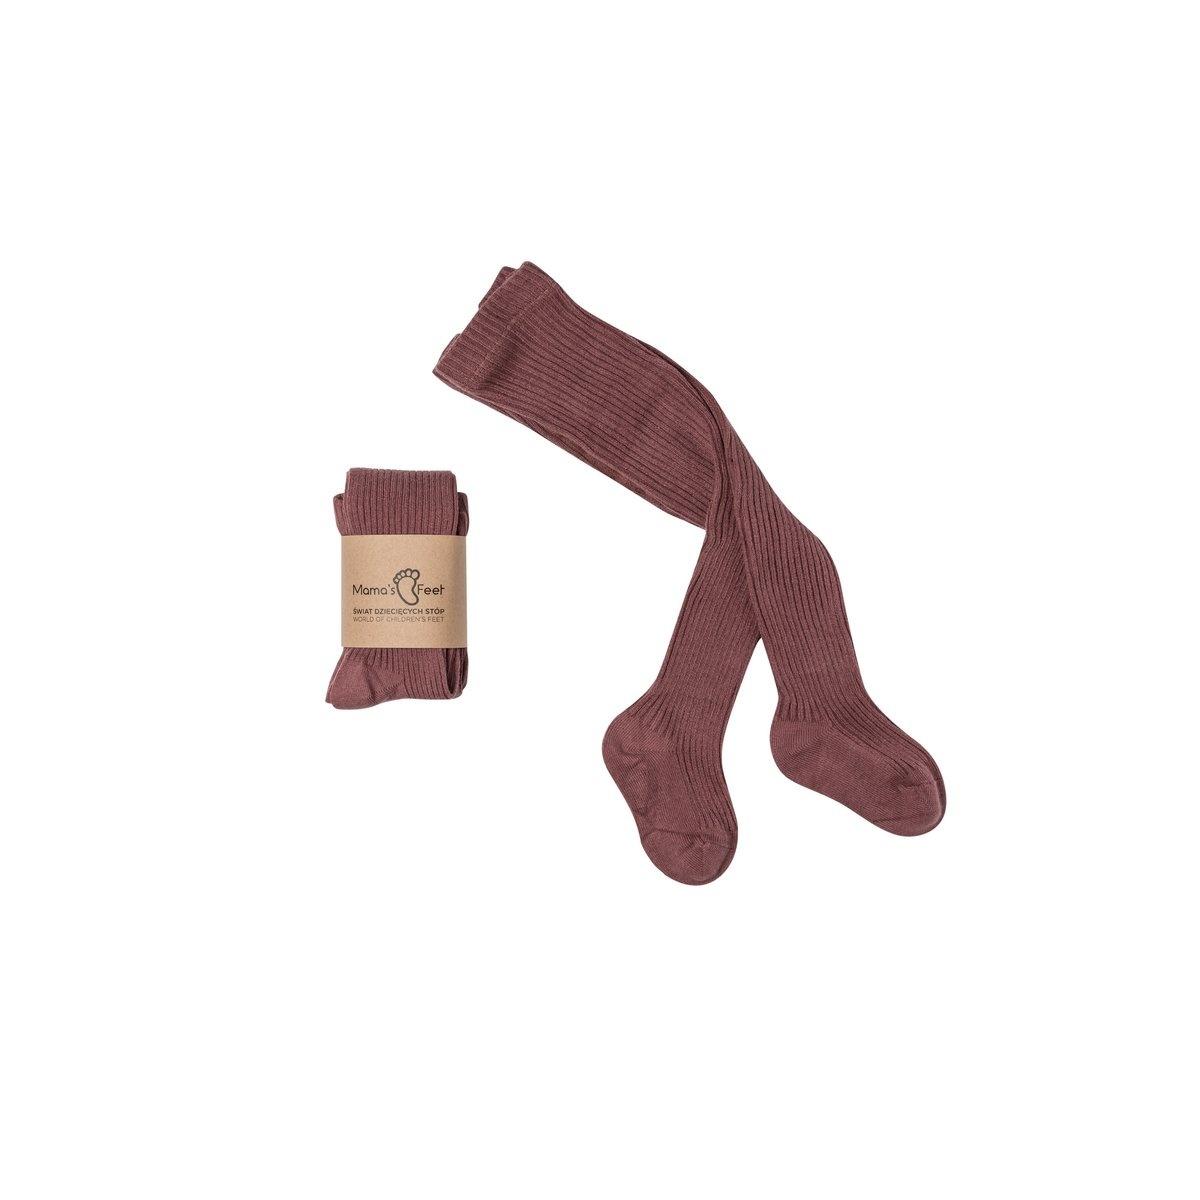 Broekkousen paars Mama's Feet-1